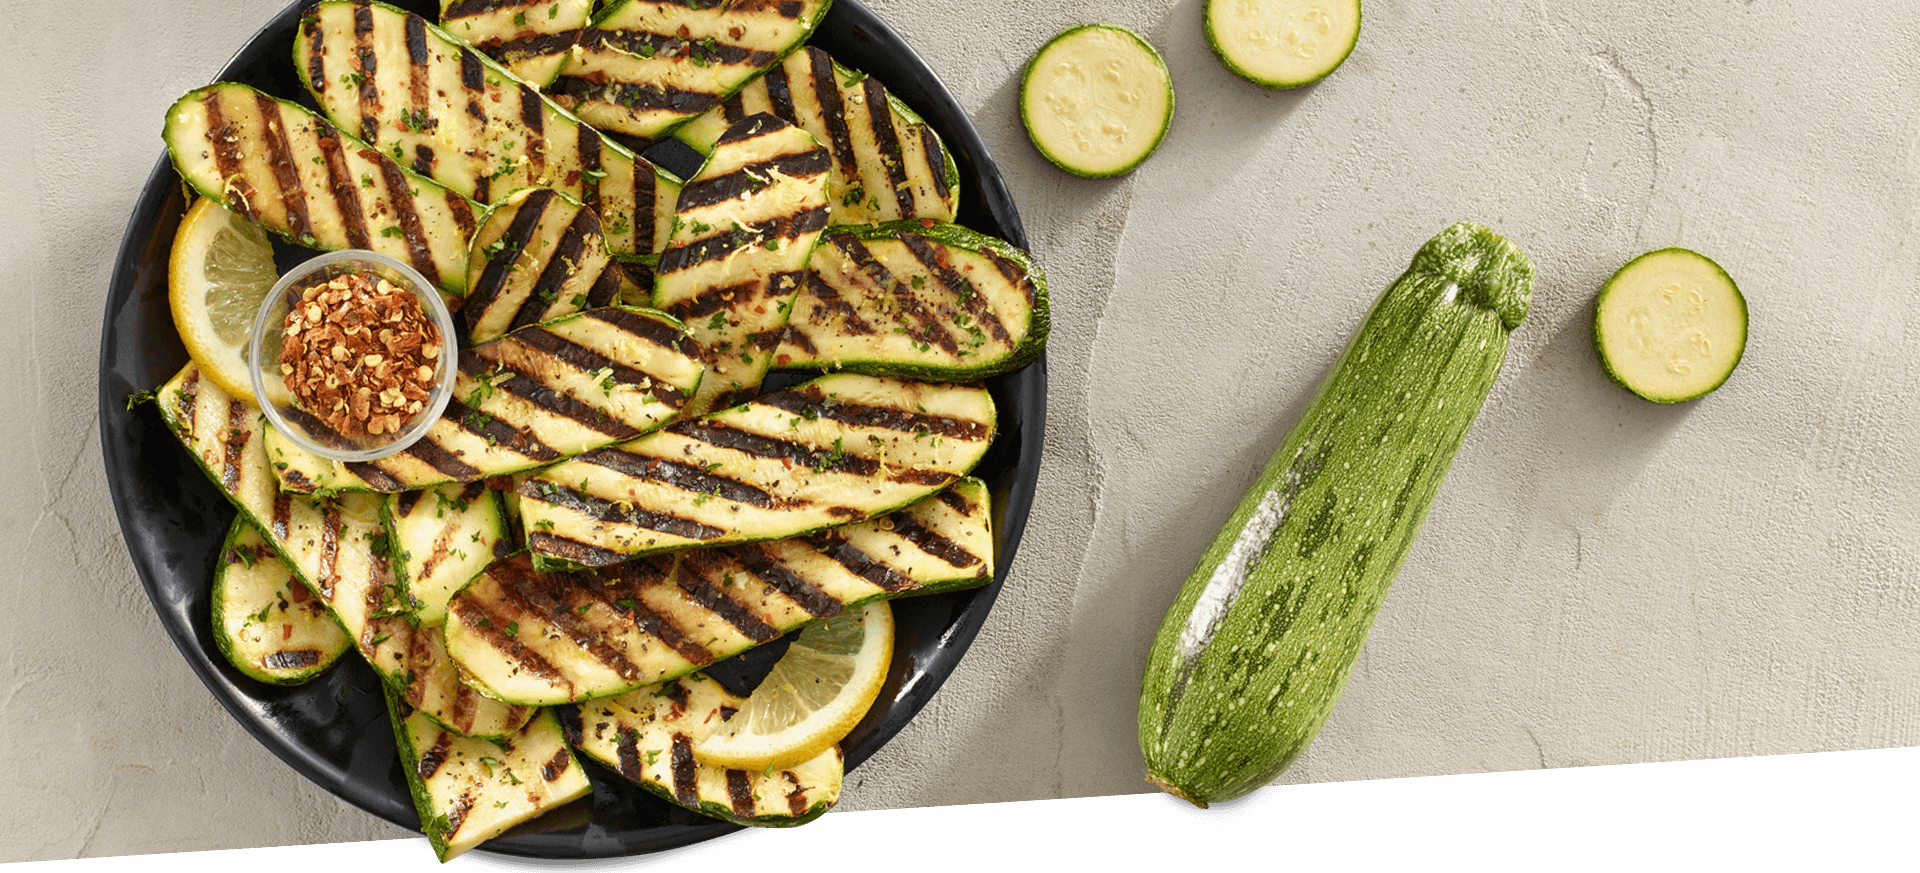 zukies grilled mini zucchini recipe header img